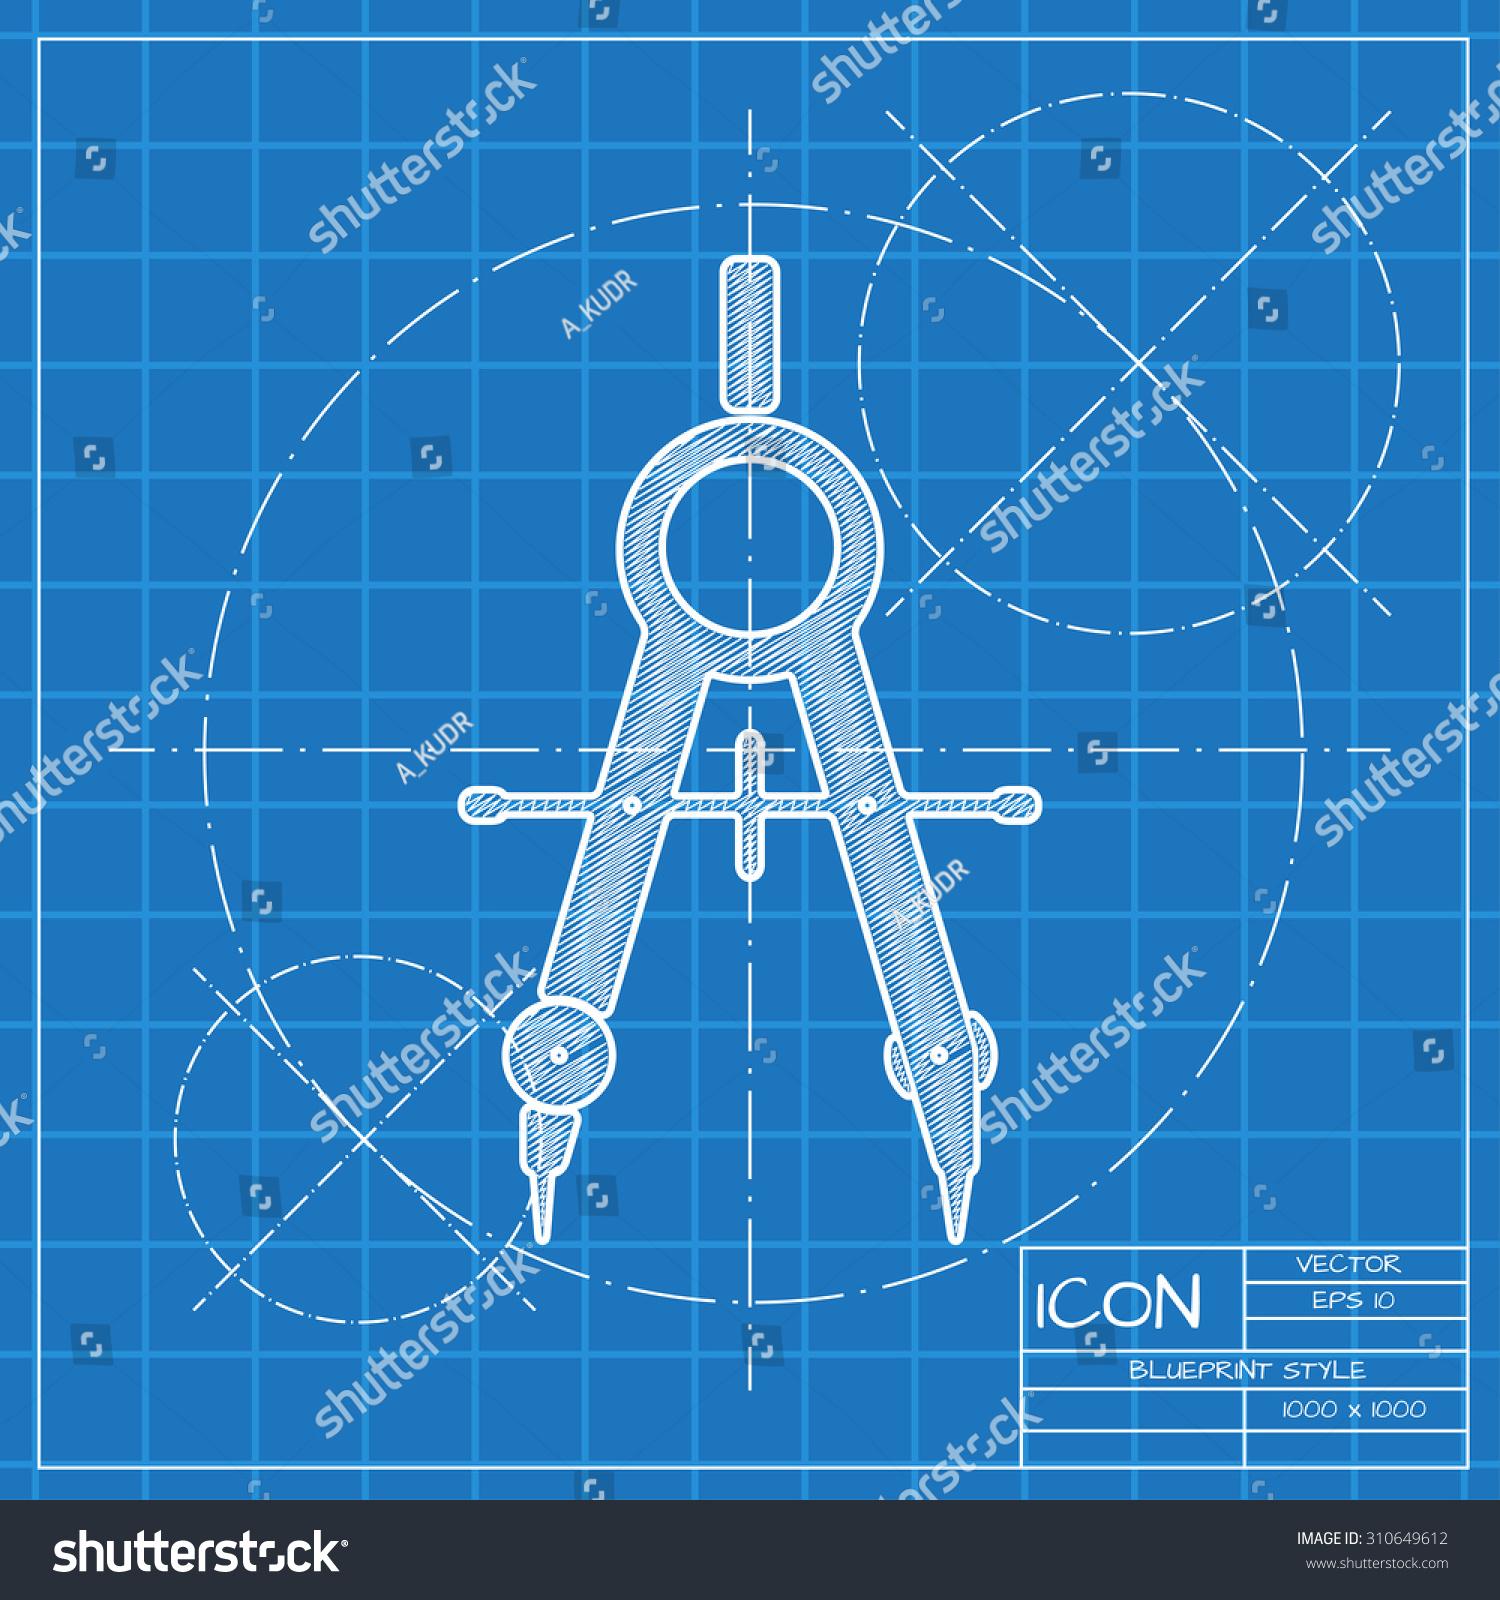 Vector Blueprint Compasses Icon Engineer Architect Stock